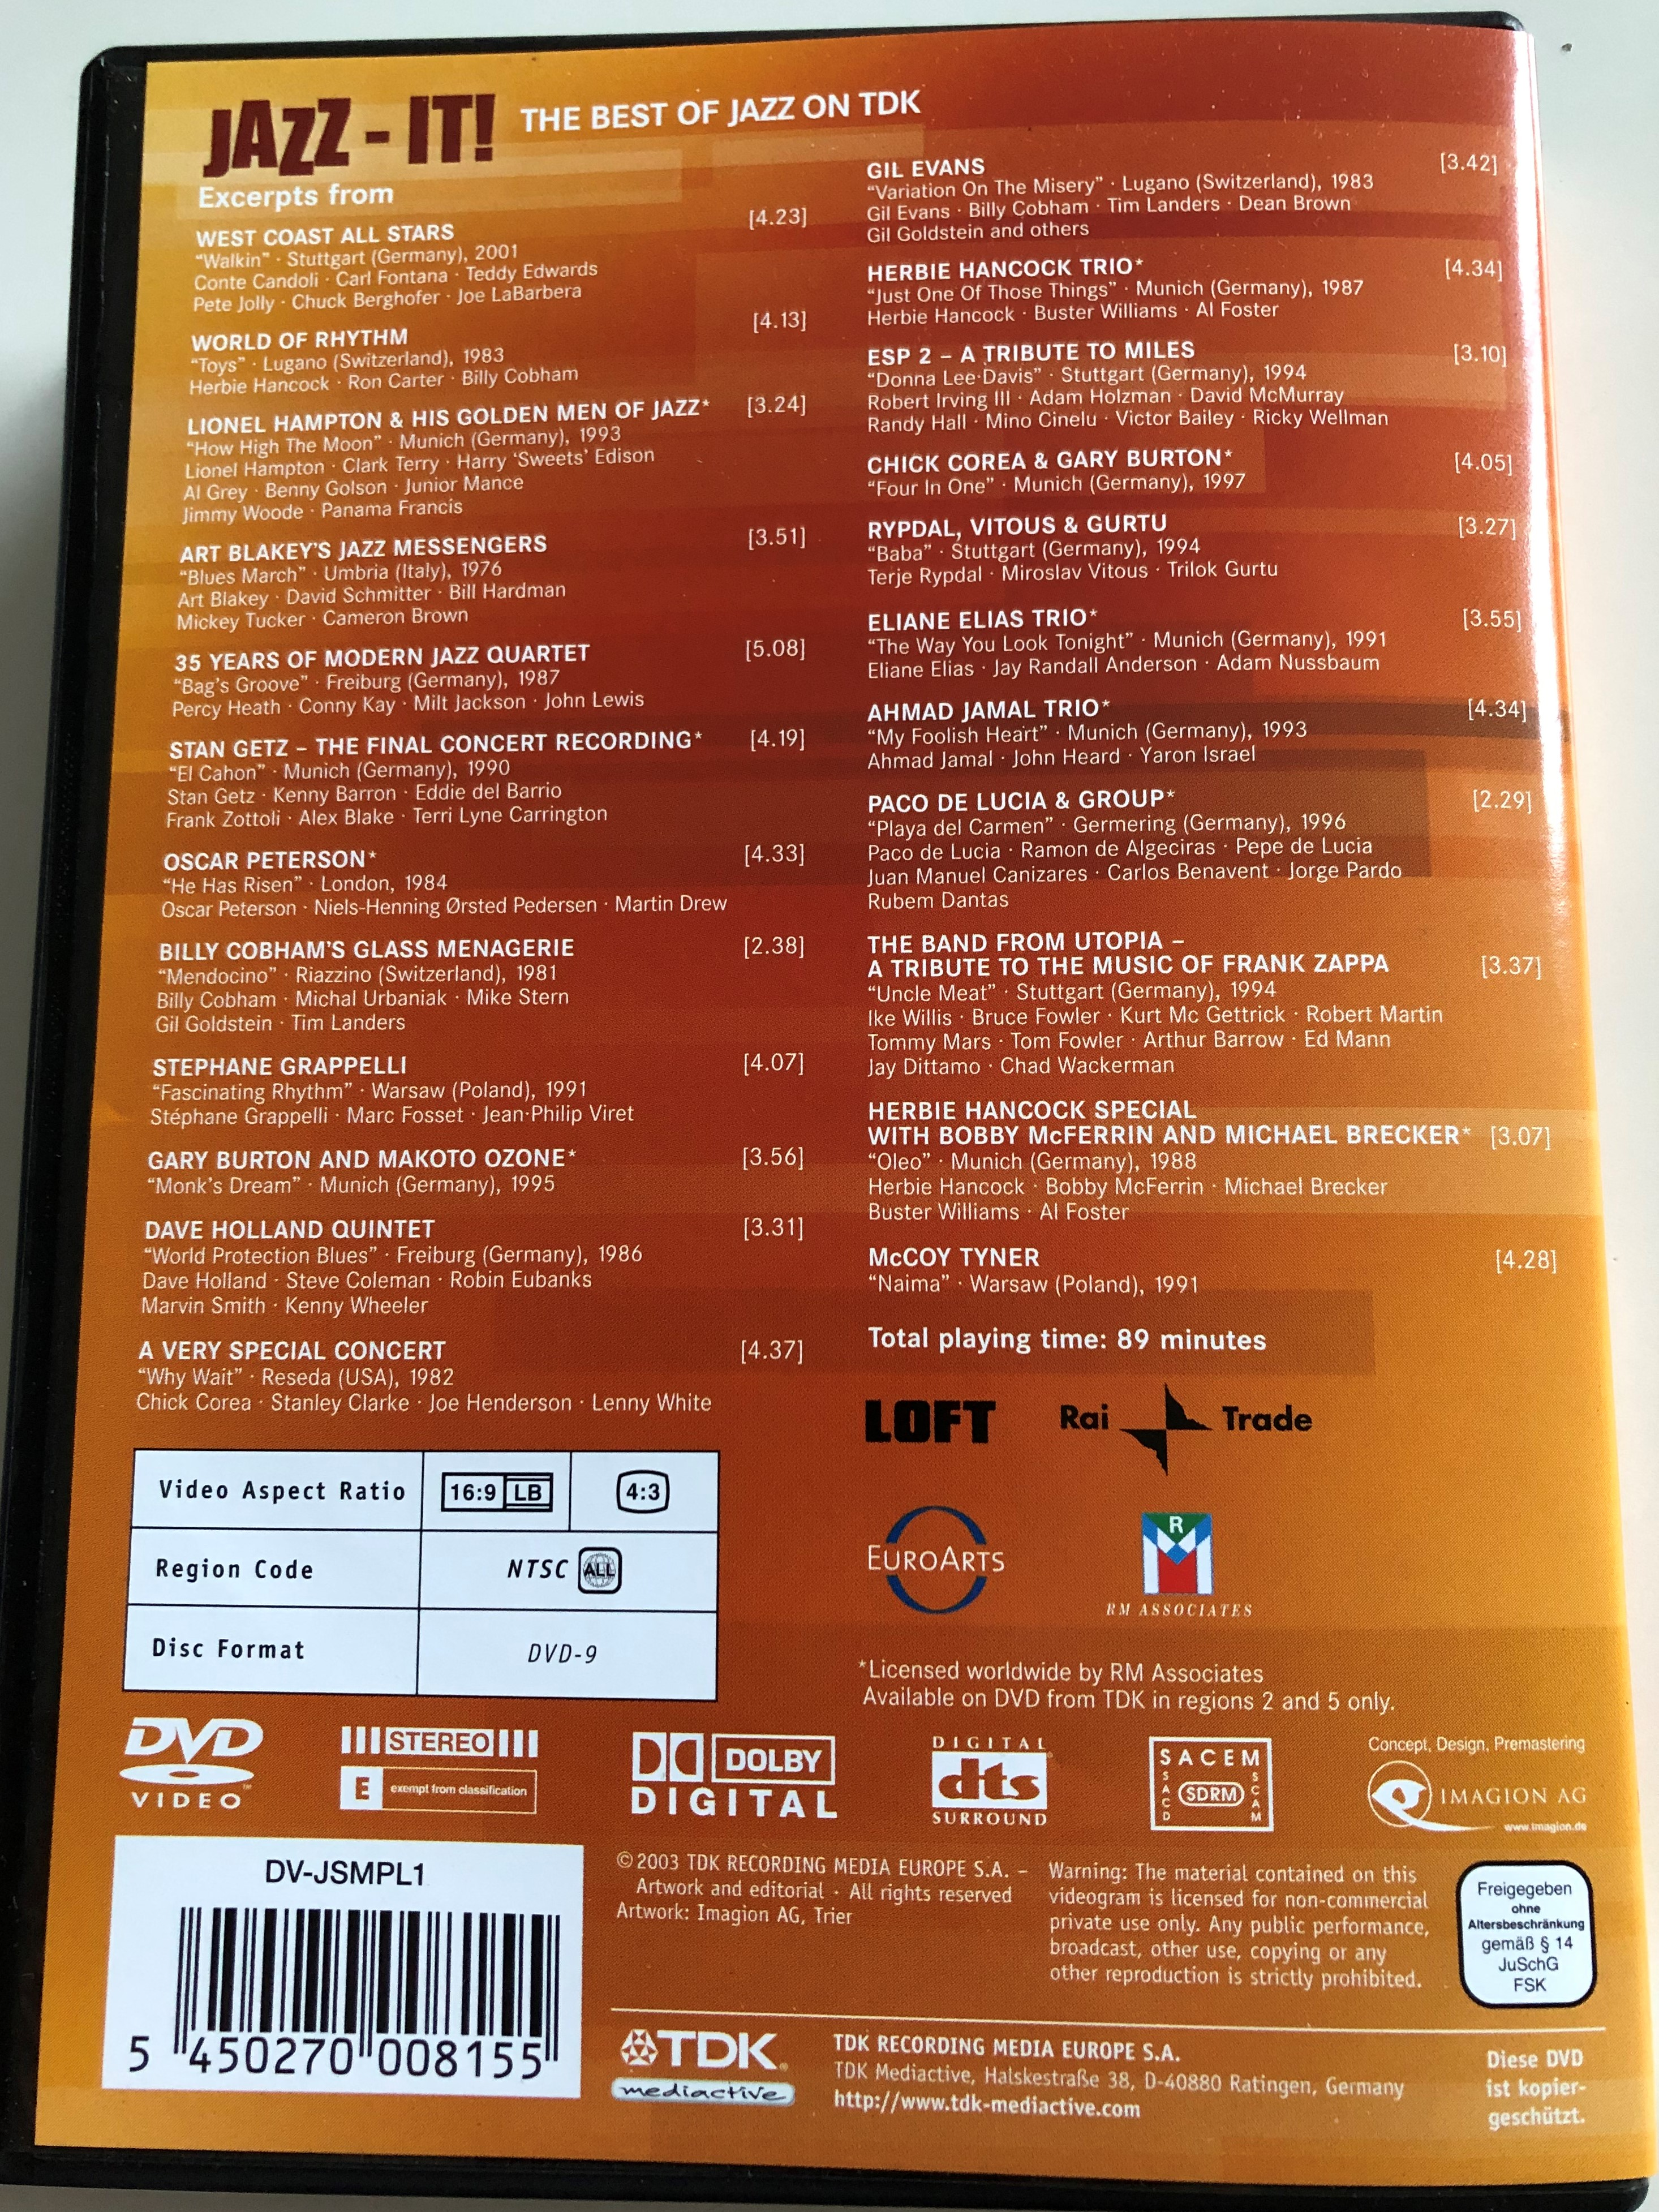 jazz-it-dvd-2003-the-best-of-jazz-on-tdk-herbie-hancock-ron-carter-stan-getz-oscar-peterson-gil-evans-mccoy-tyner-dv-jsmpl1-3-.jpg